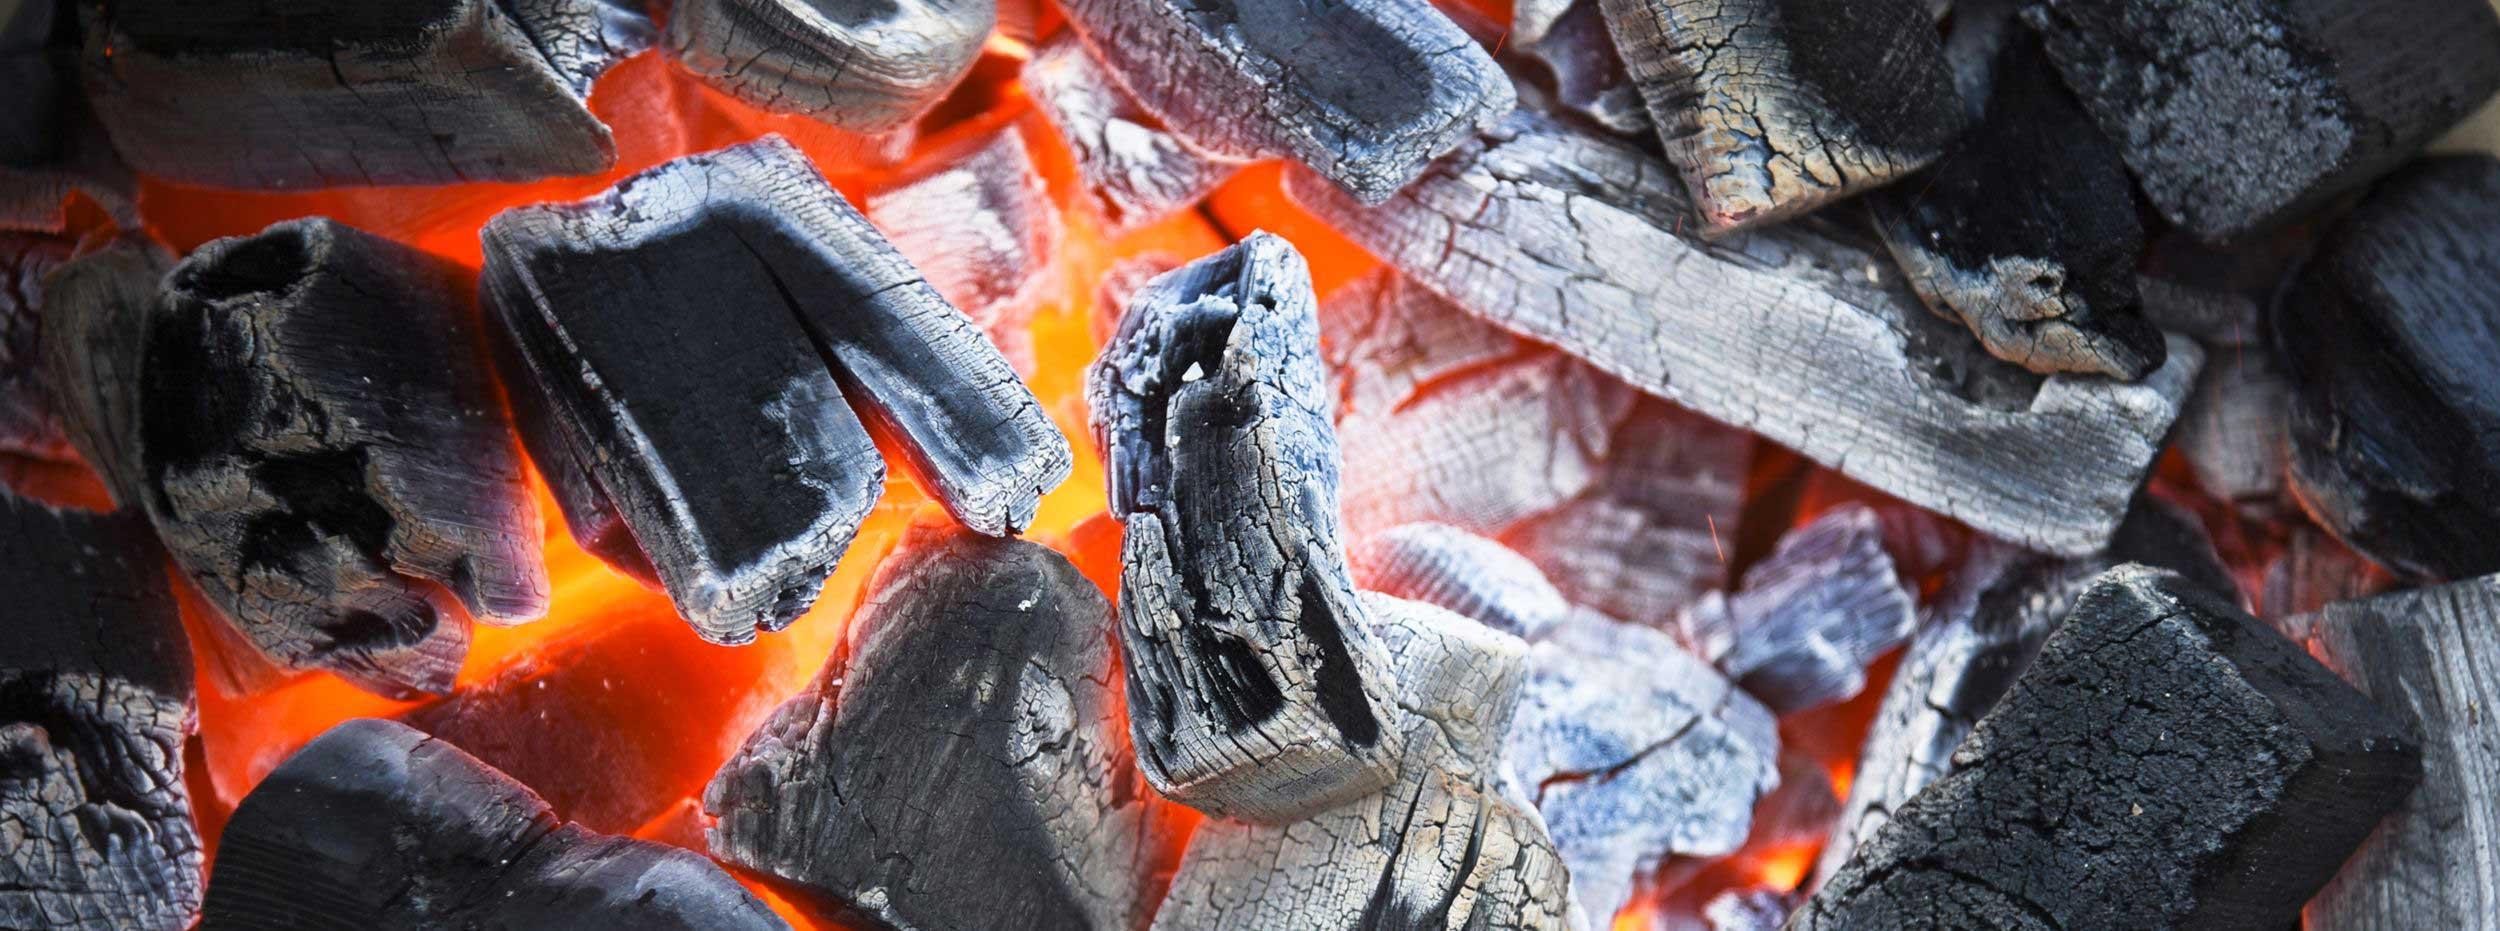 glowing-charcoal.jpg